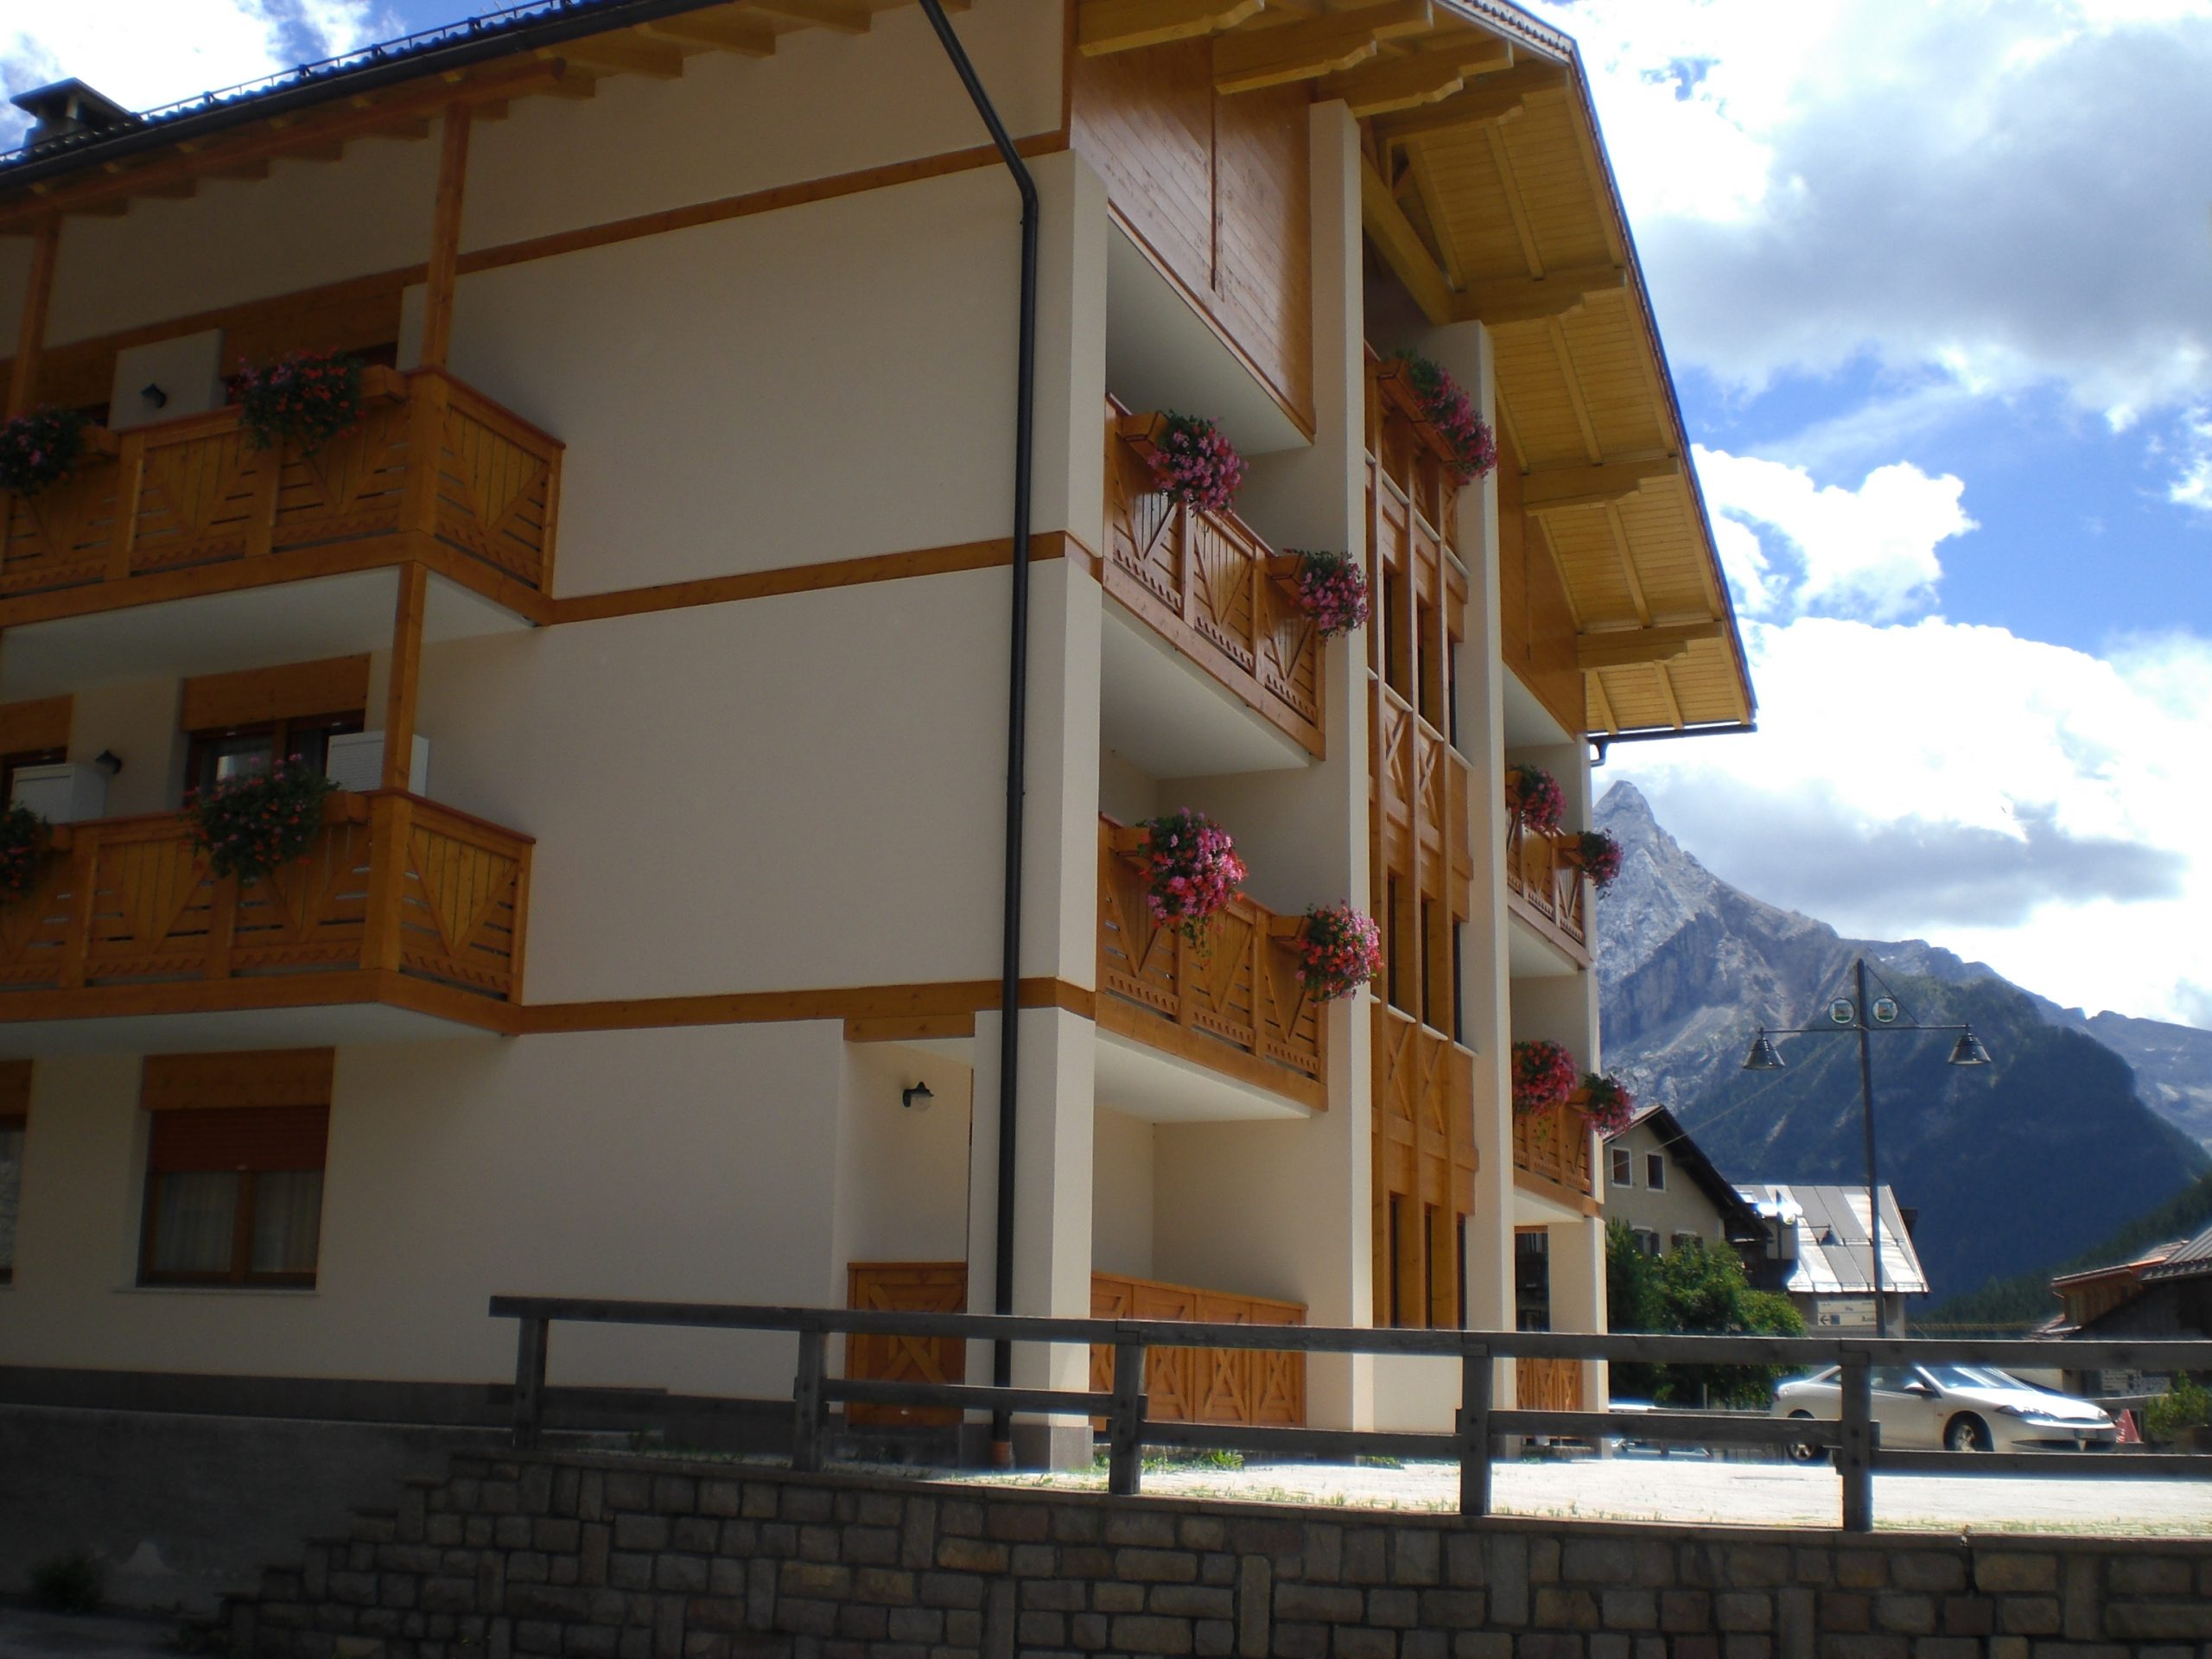 Appartamento a Canazei rif 1154